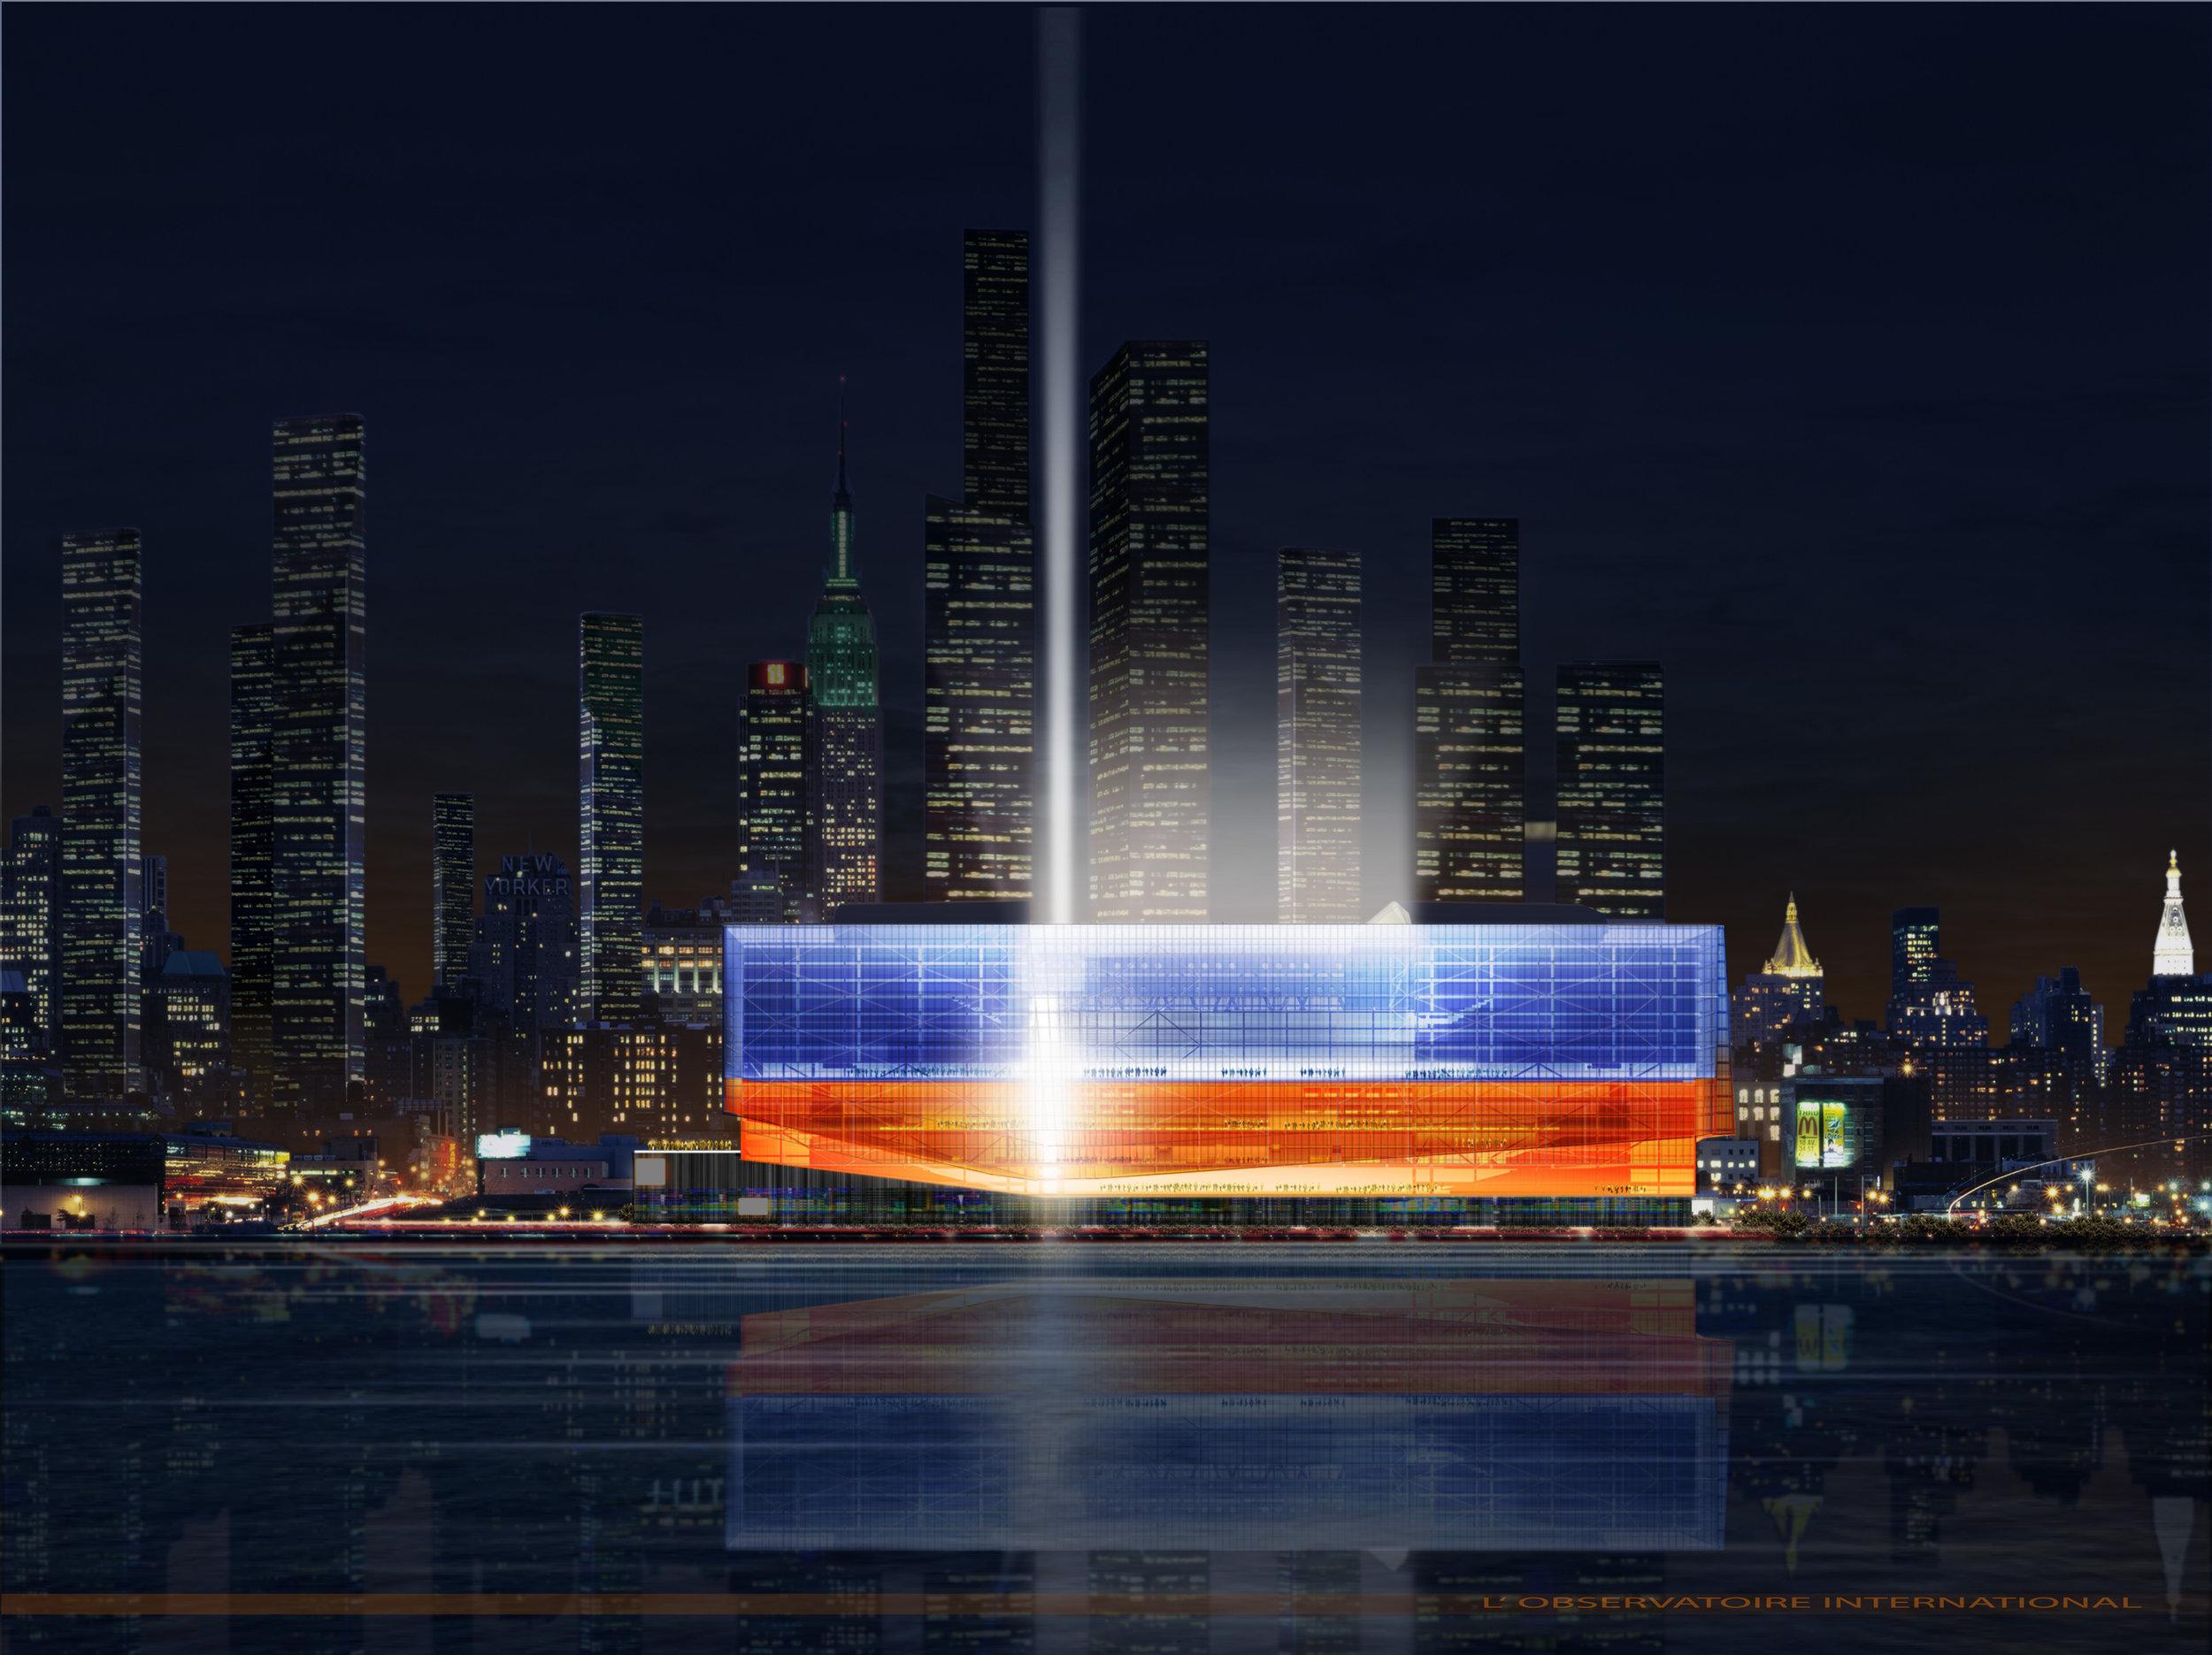 New York Jets Stadium Proposal (2005)